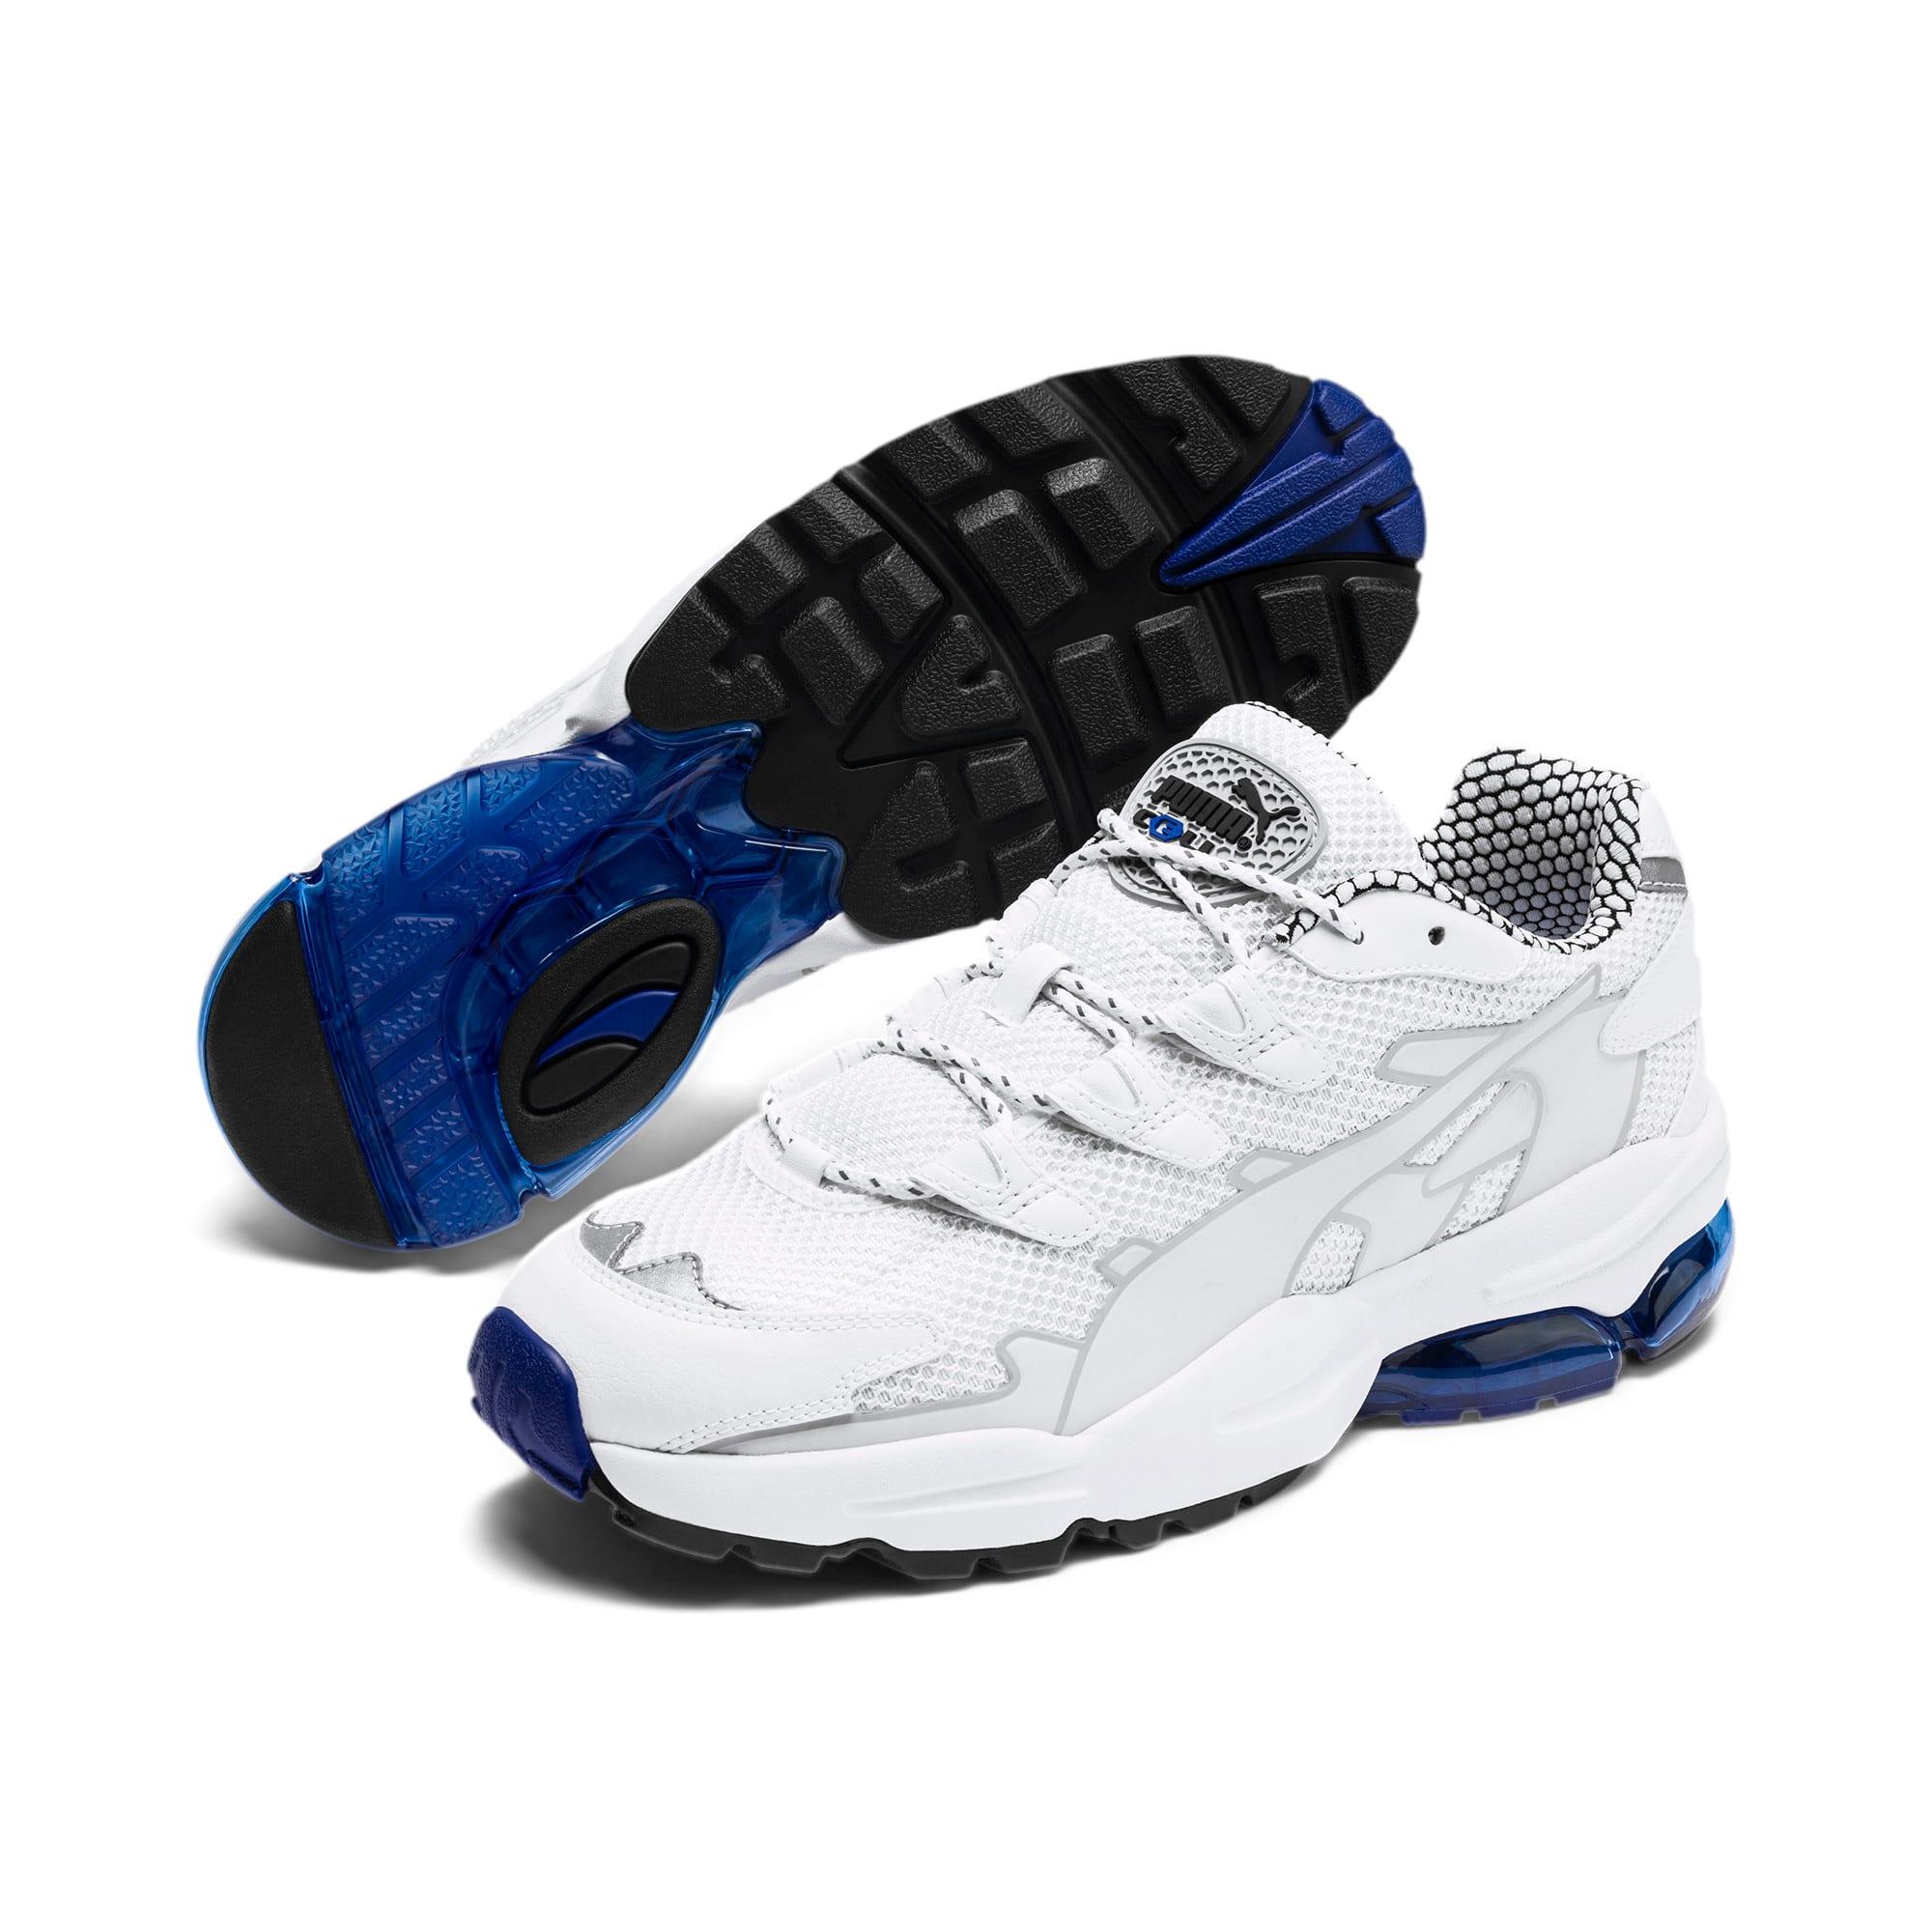 Miniatura 3 de Zapatos deportivos CELL Alien Kotto, Puma White-Puma White, mediano